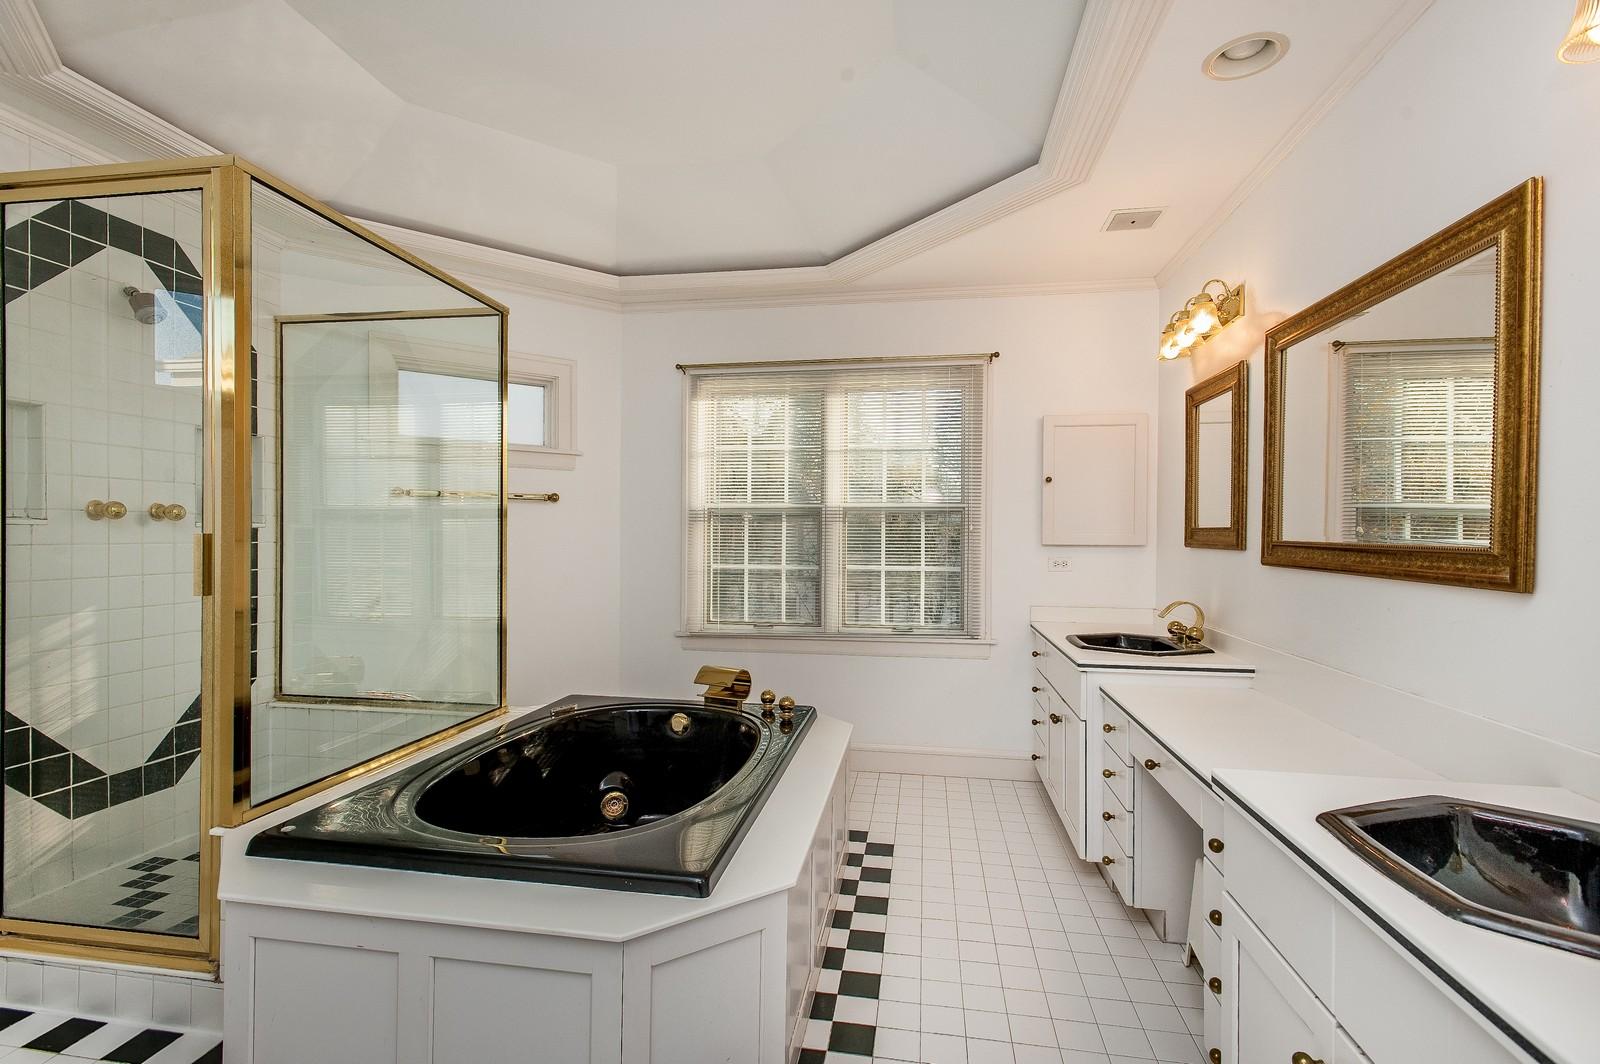 Real Estate Photography - 556 Winnetka Ave, Winnetka, IL, 60093 - Master Bathroom